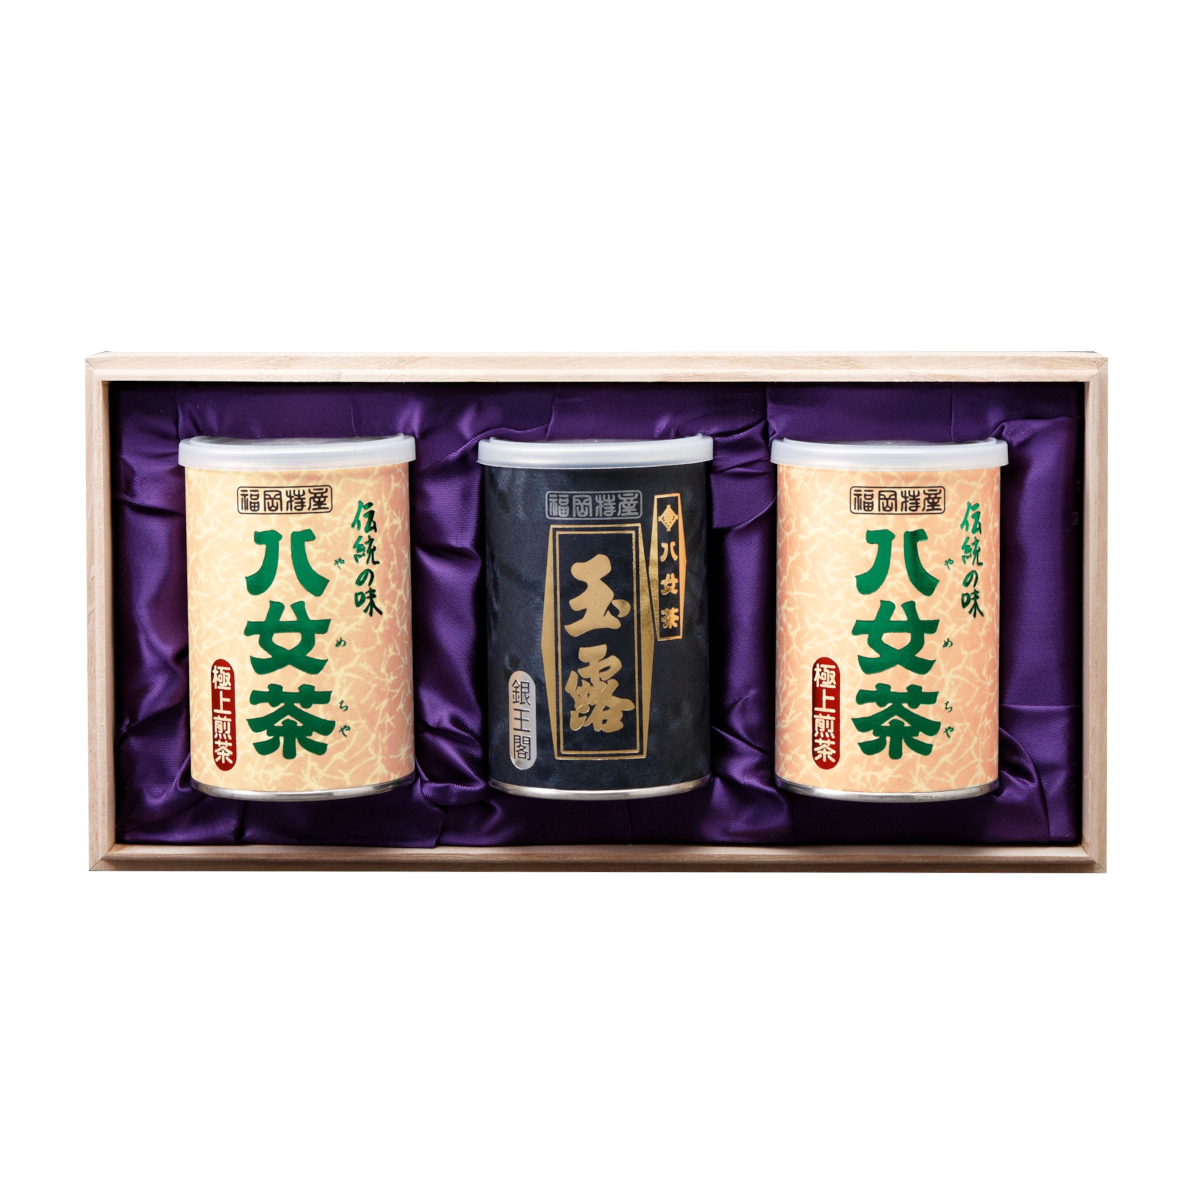 【G-234・ホヌ】極上煎茶・玉露銀 100g×3缶木箱ギフト